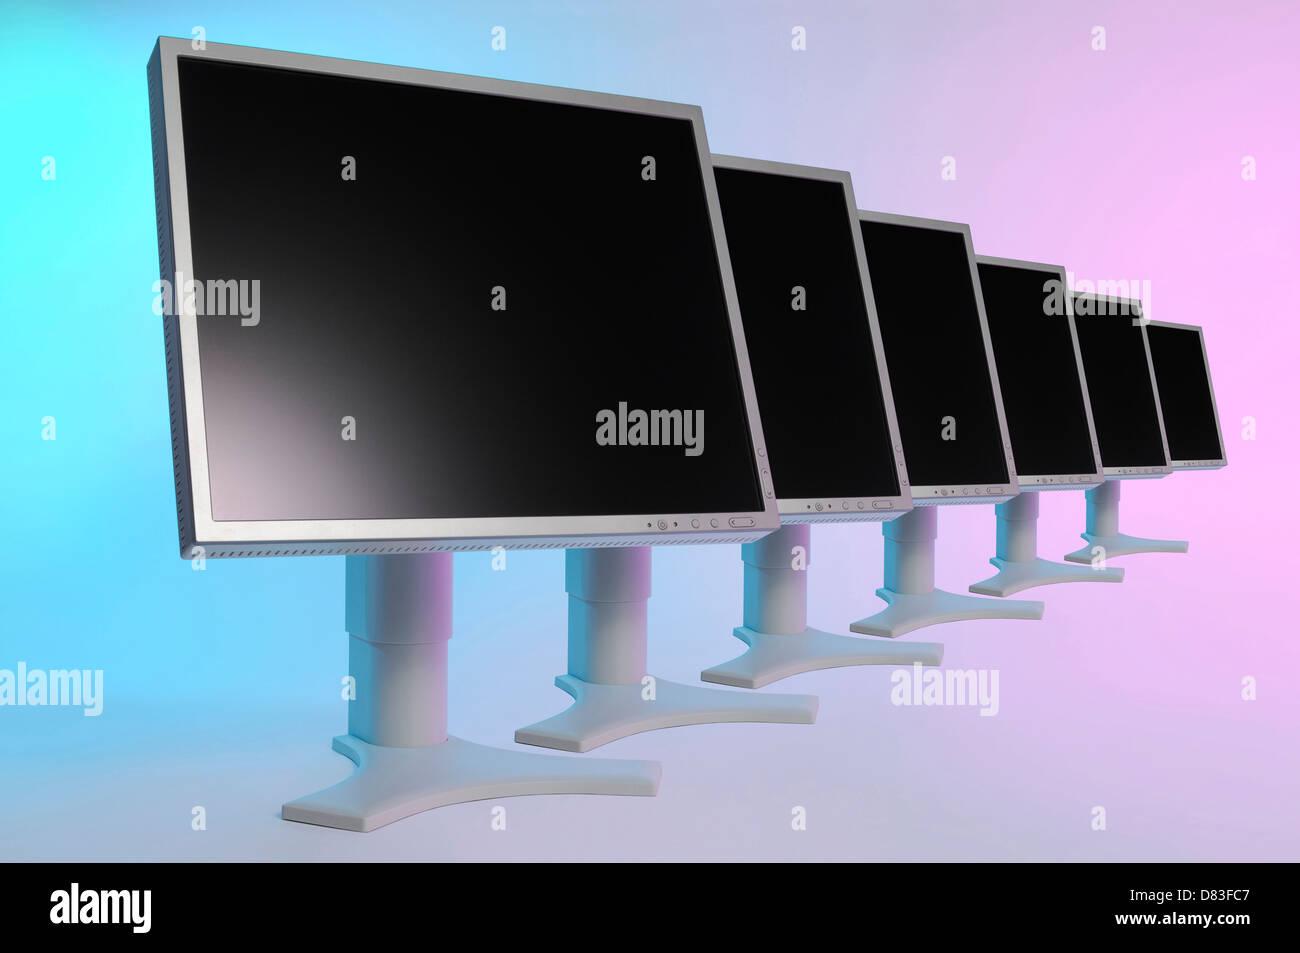 Row of LCD monitors - Stock Image